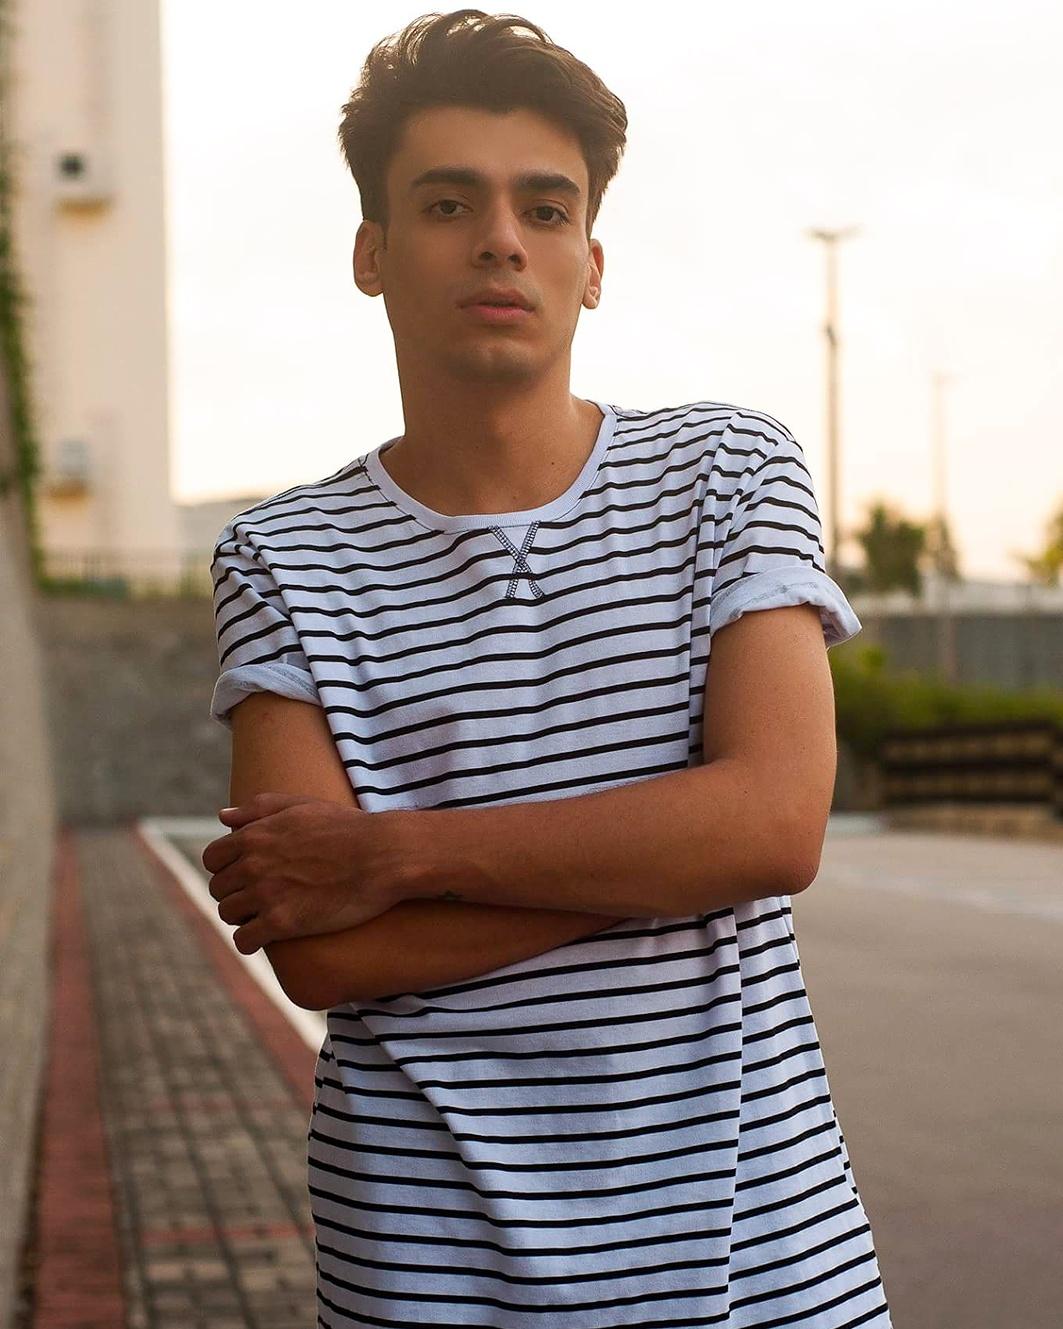 alex-cursino-blogueiro-de-moda-moda-masculina-moda-sem-censura-blogger-digital-influencer-social-media-look-masculino-como-usar-listras-menswear-dicas-de-moda-6